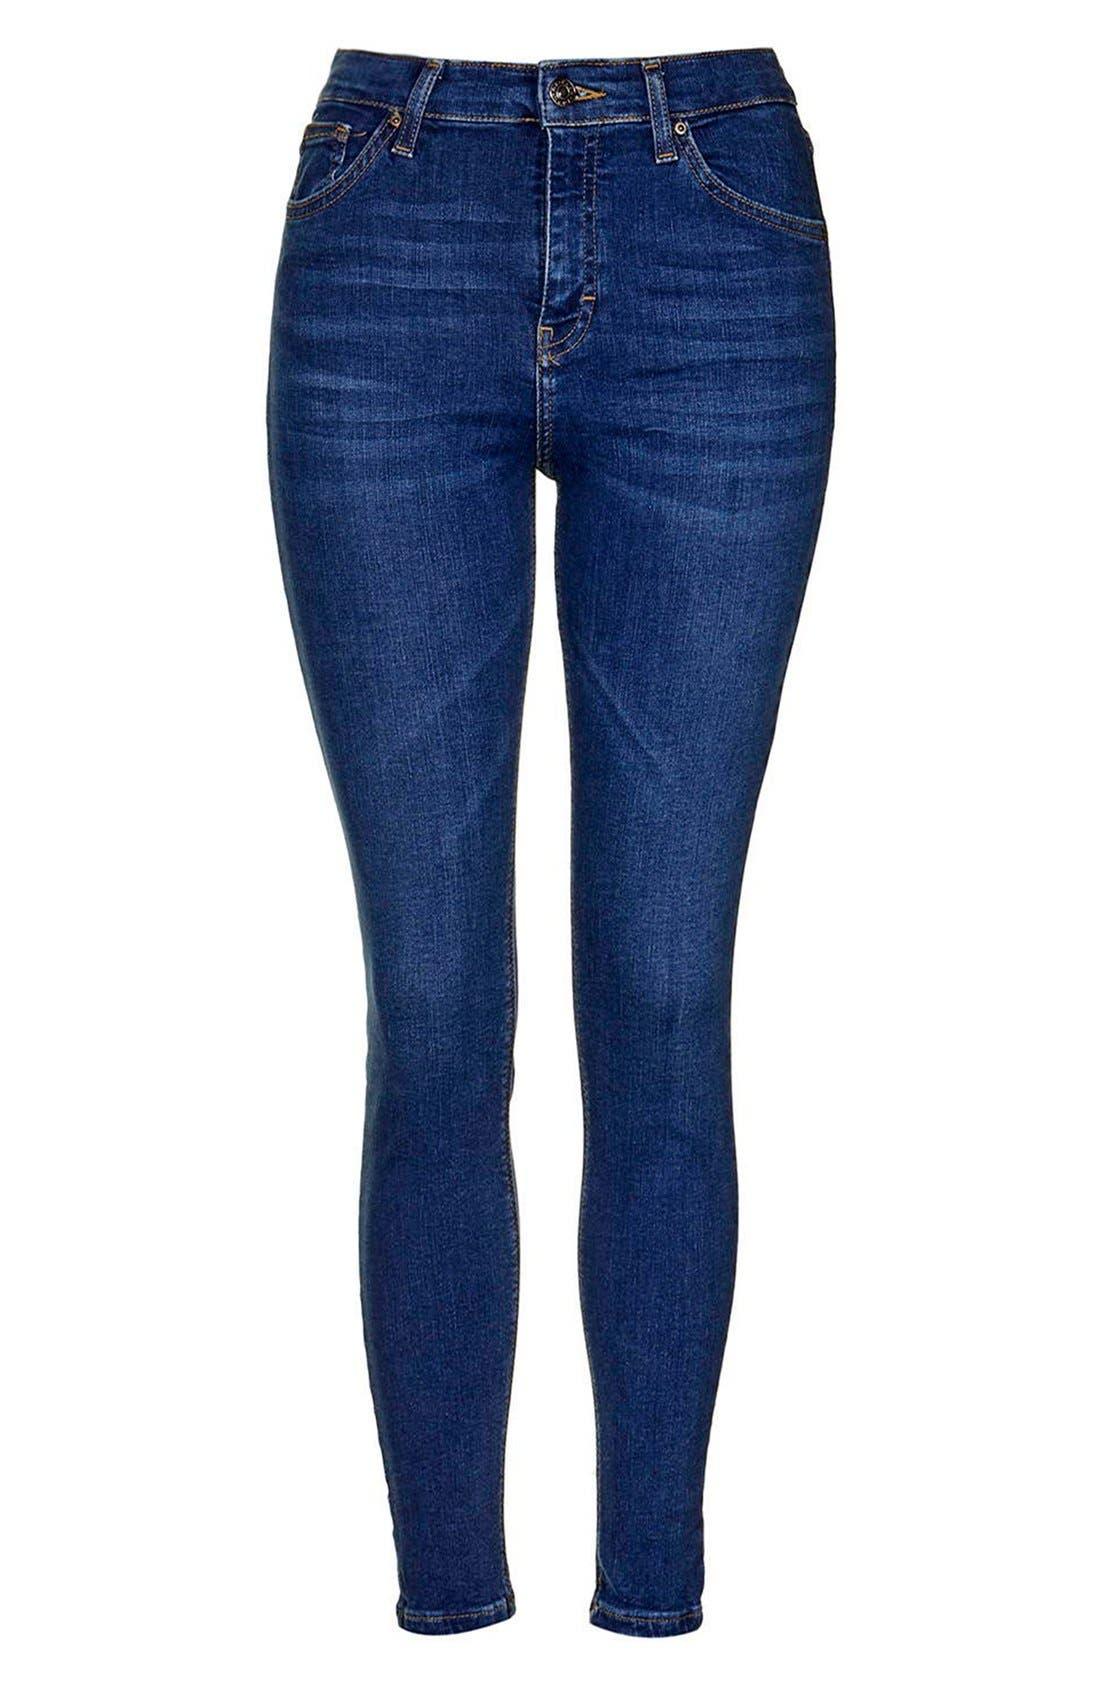 Alternate Image 4  - Topshop 'Jamie' High Rise Ankle Skinny Jeans (Petite)